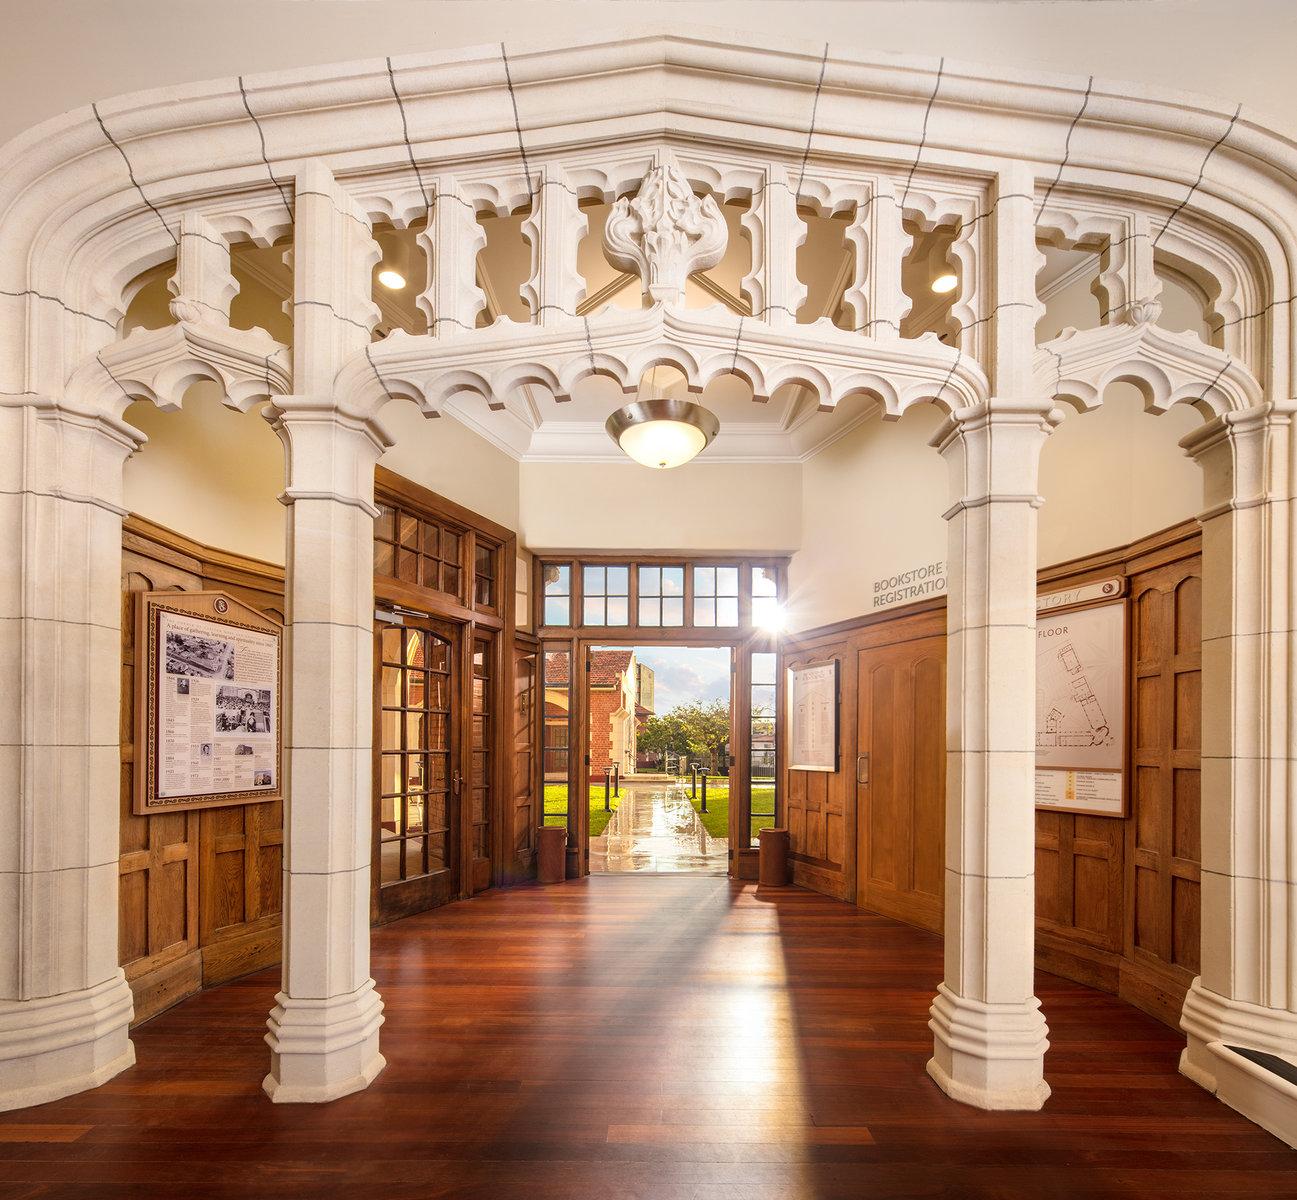 A Treasured Landmark Reborn—Scientology Opens New Church